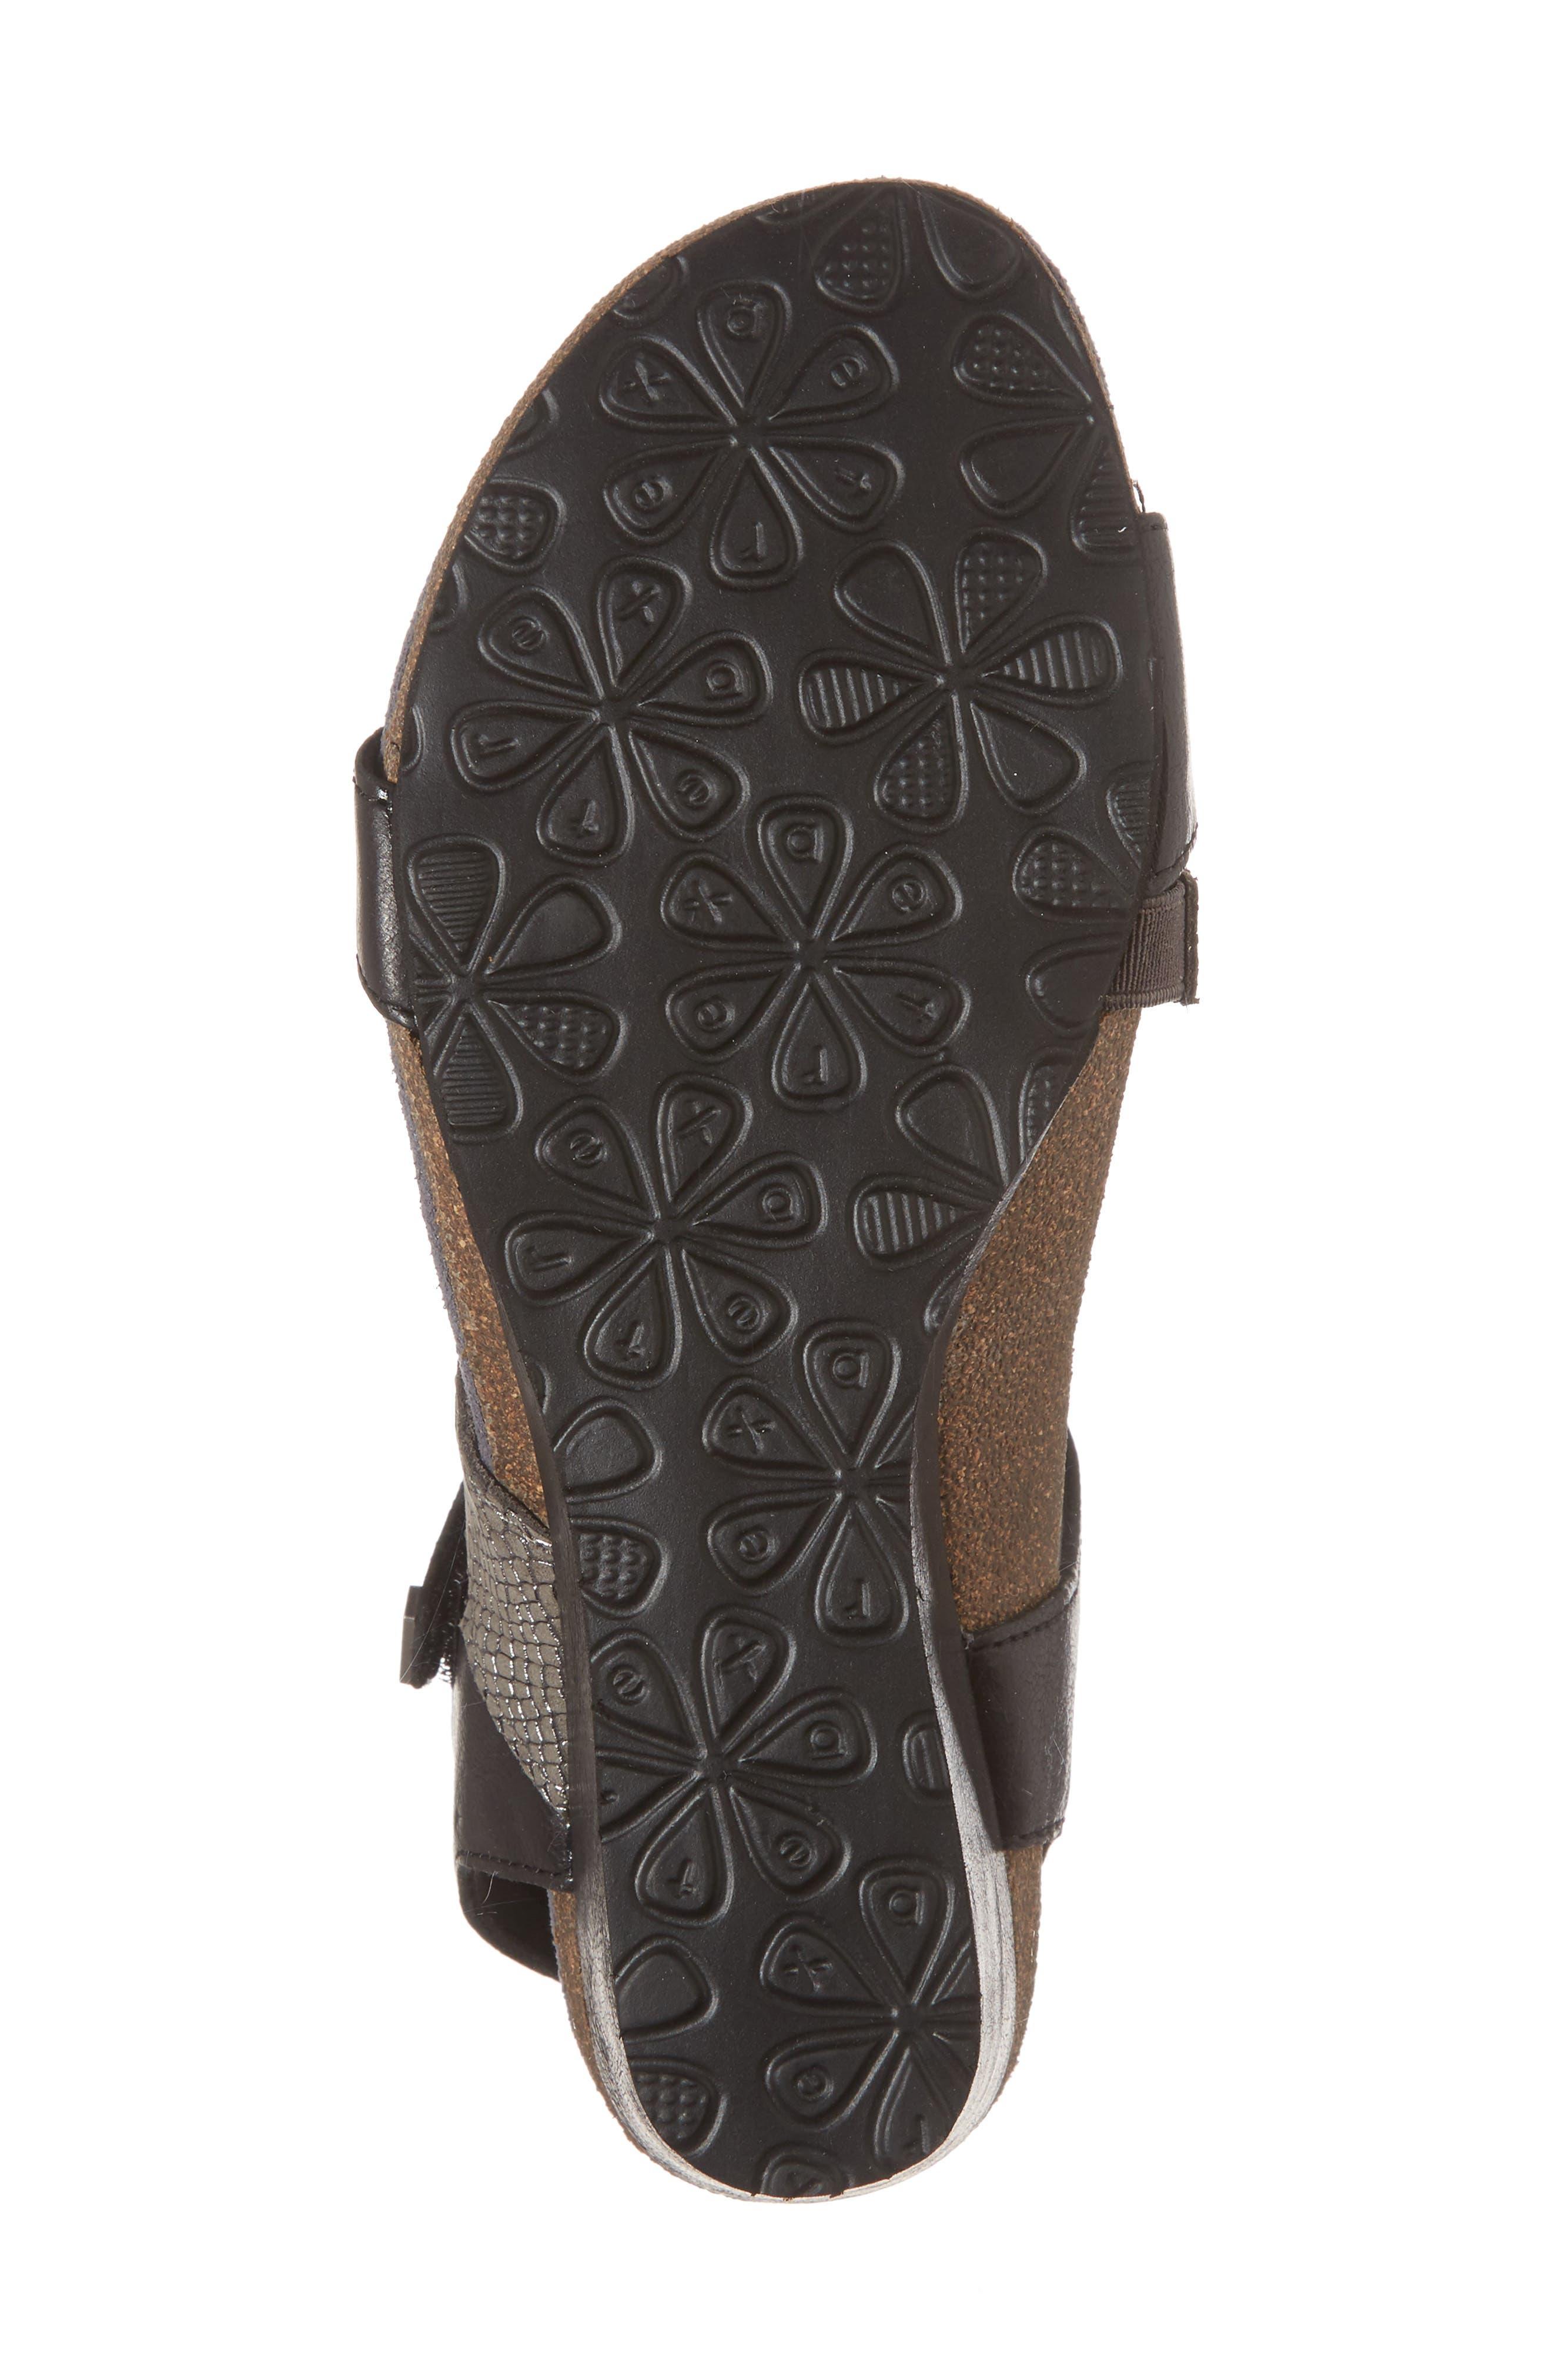 Brynn Asymmetrical Wedge Sandal,                             Alternate thumbnail 6, color,                             Black Leather